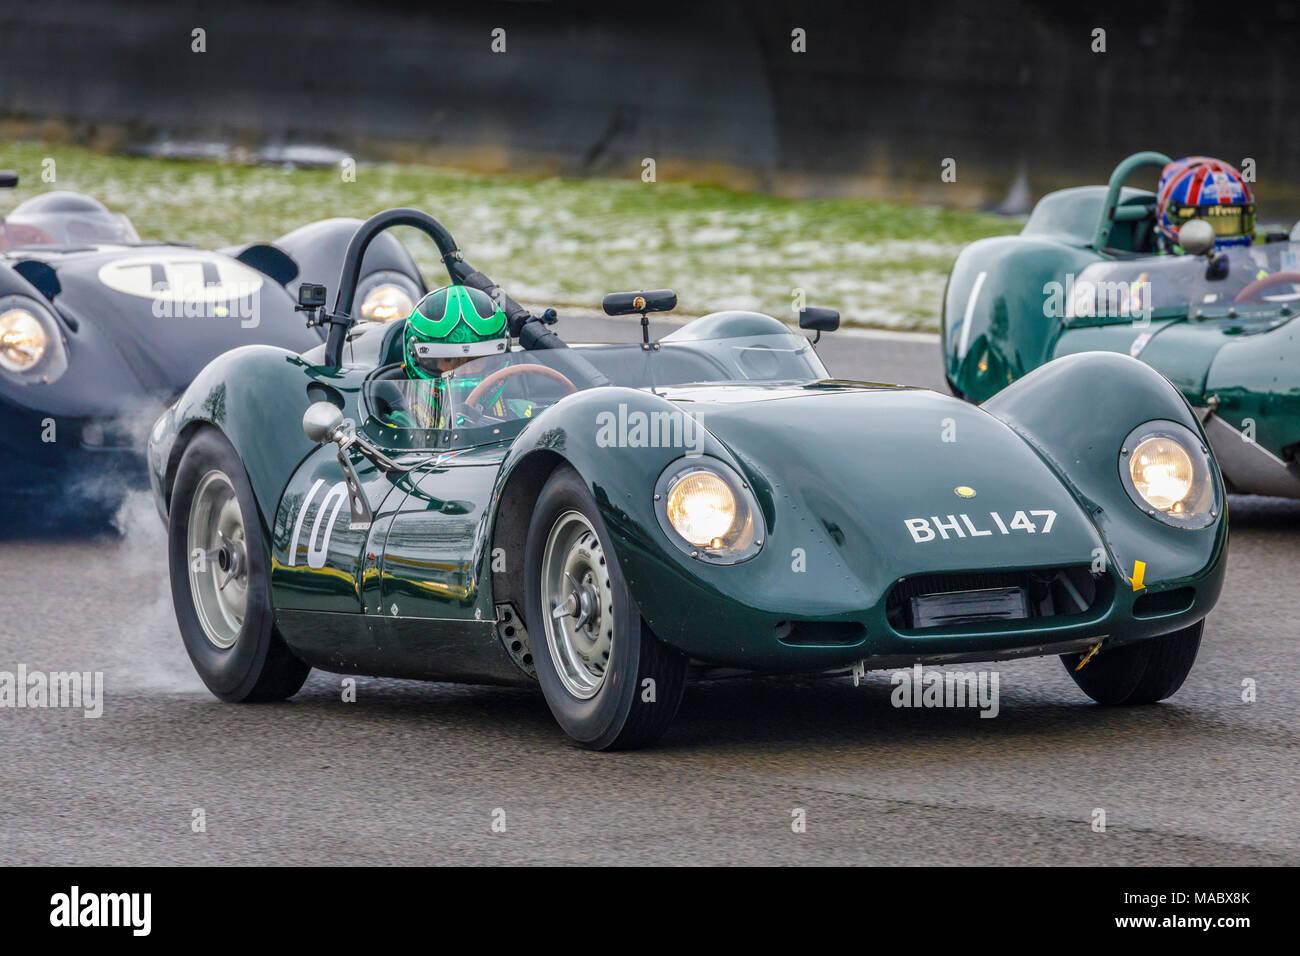 "1958 Lister-Jaguar ""KNORRIGEN"" mit Fahrer Stefan Ziegler während der salvadori Cup Rennen am Goodwood 76th Mitgliederversammlung, Sussex, UK. Stockbild"